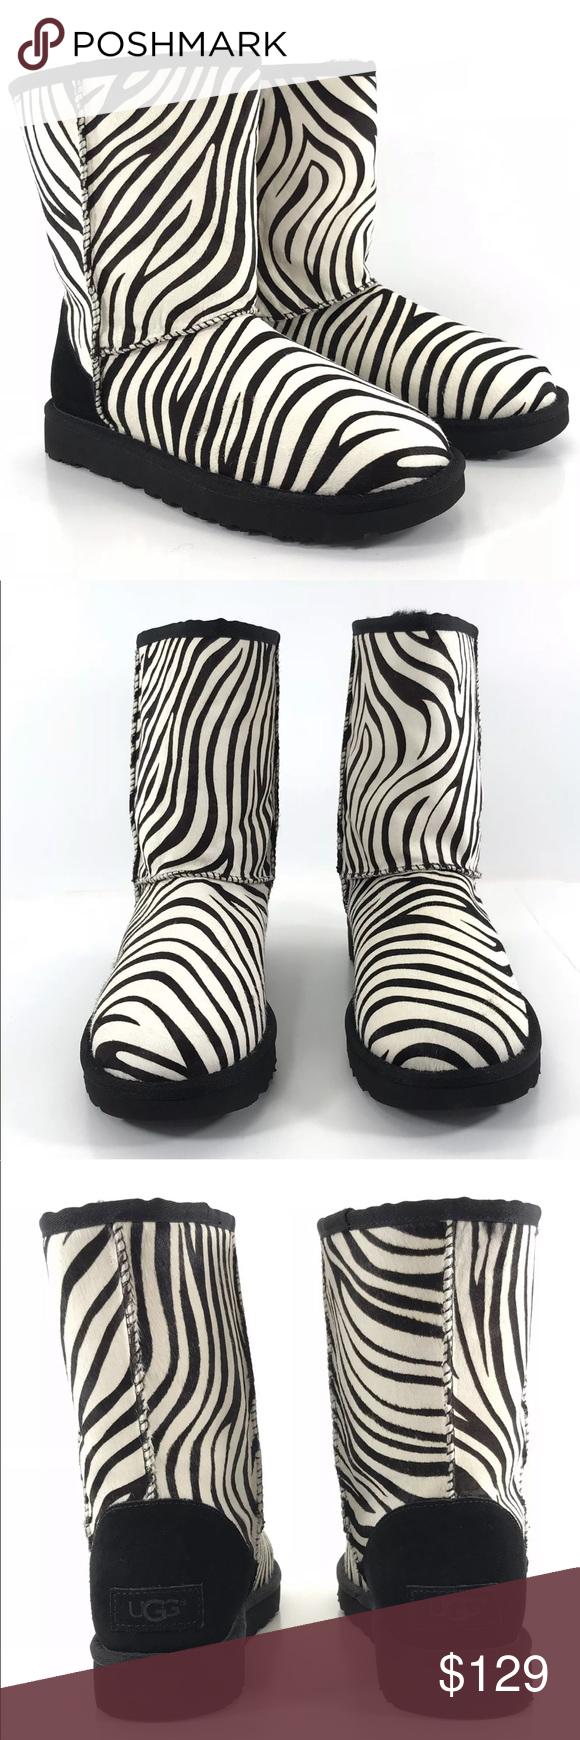 0f35fca4a2e UGG Winter Boots Classic Short Zebra Calf Hair UGG Australia Winter ...